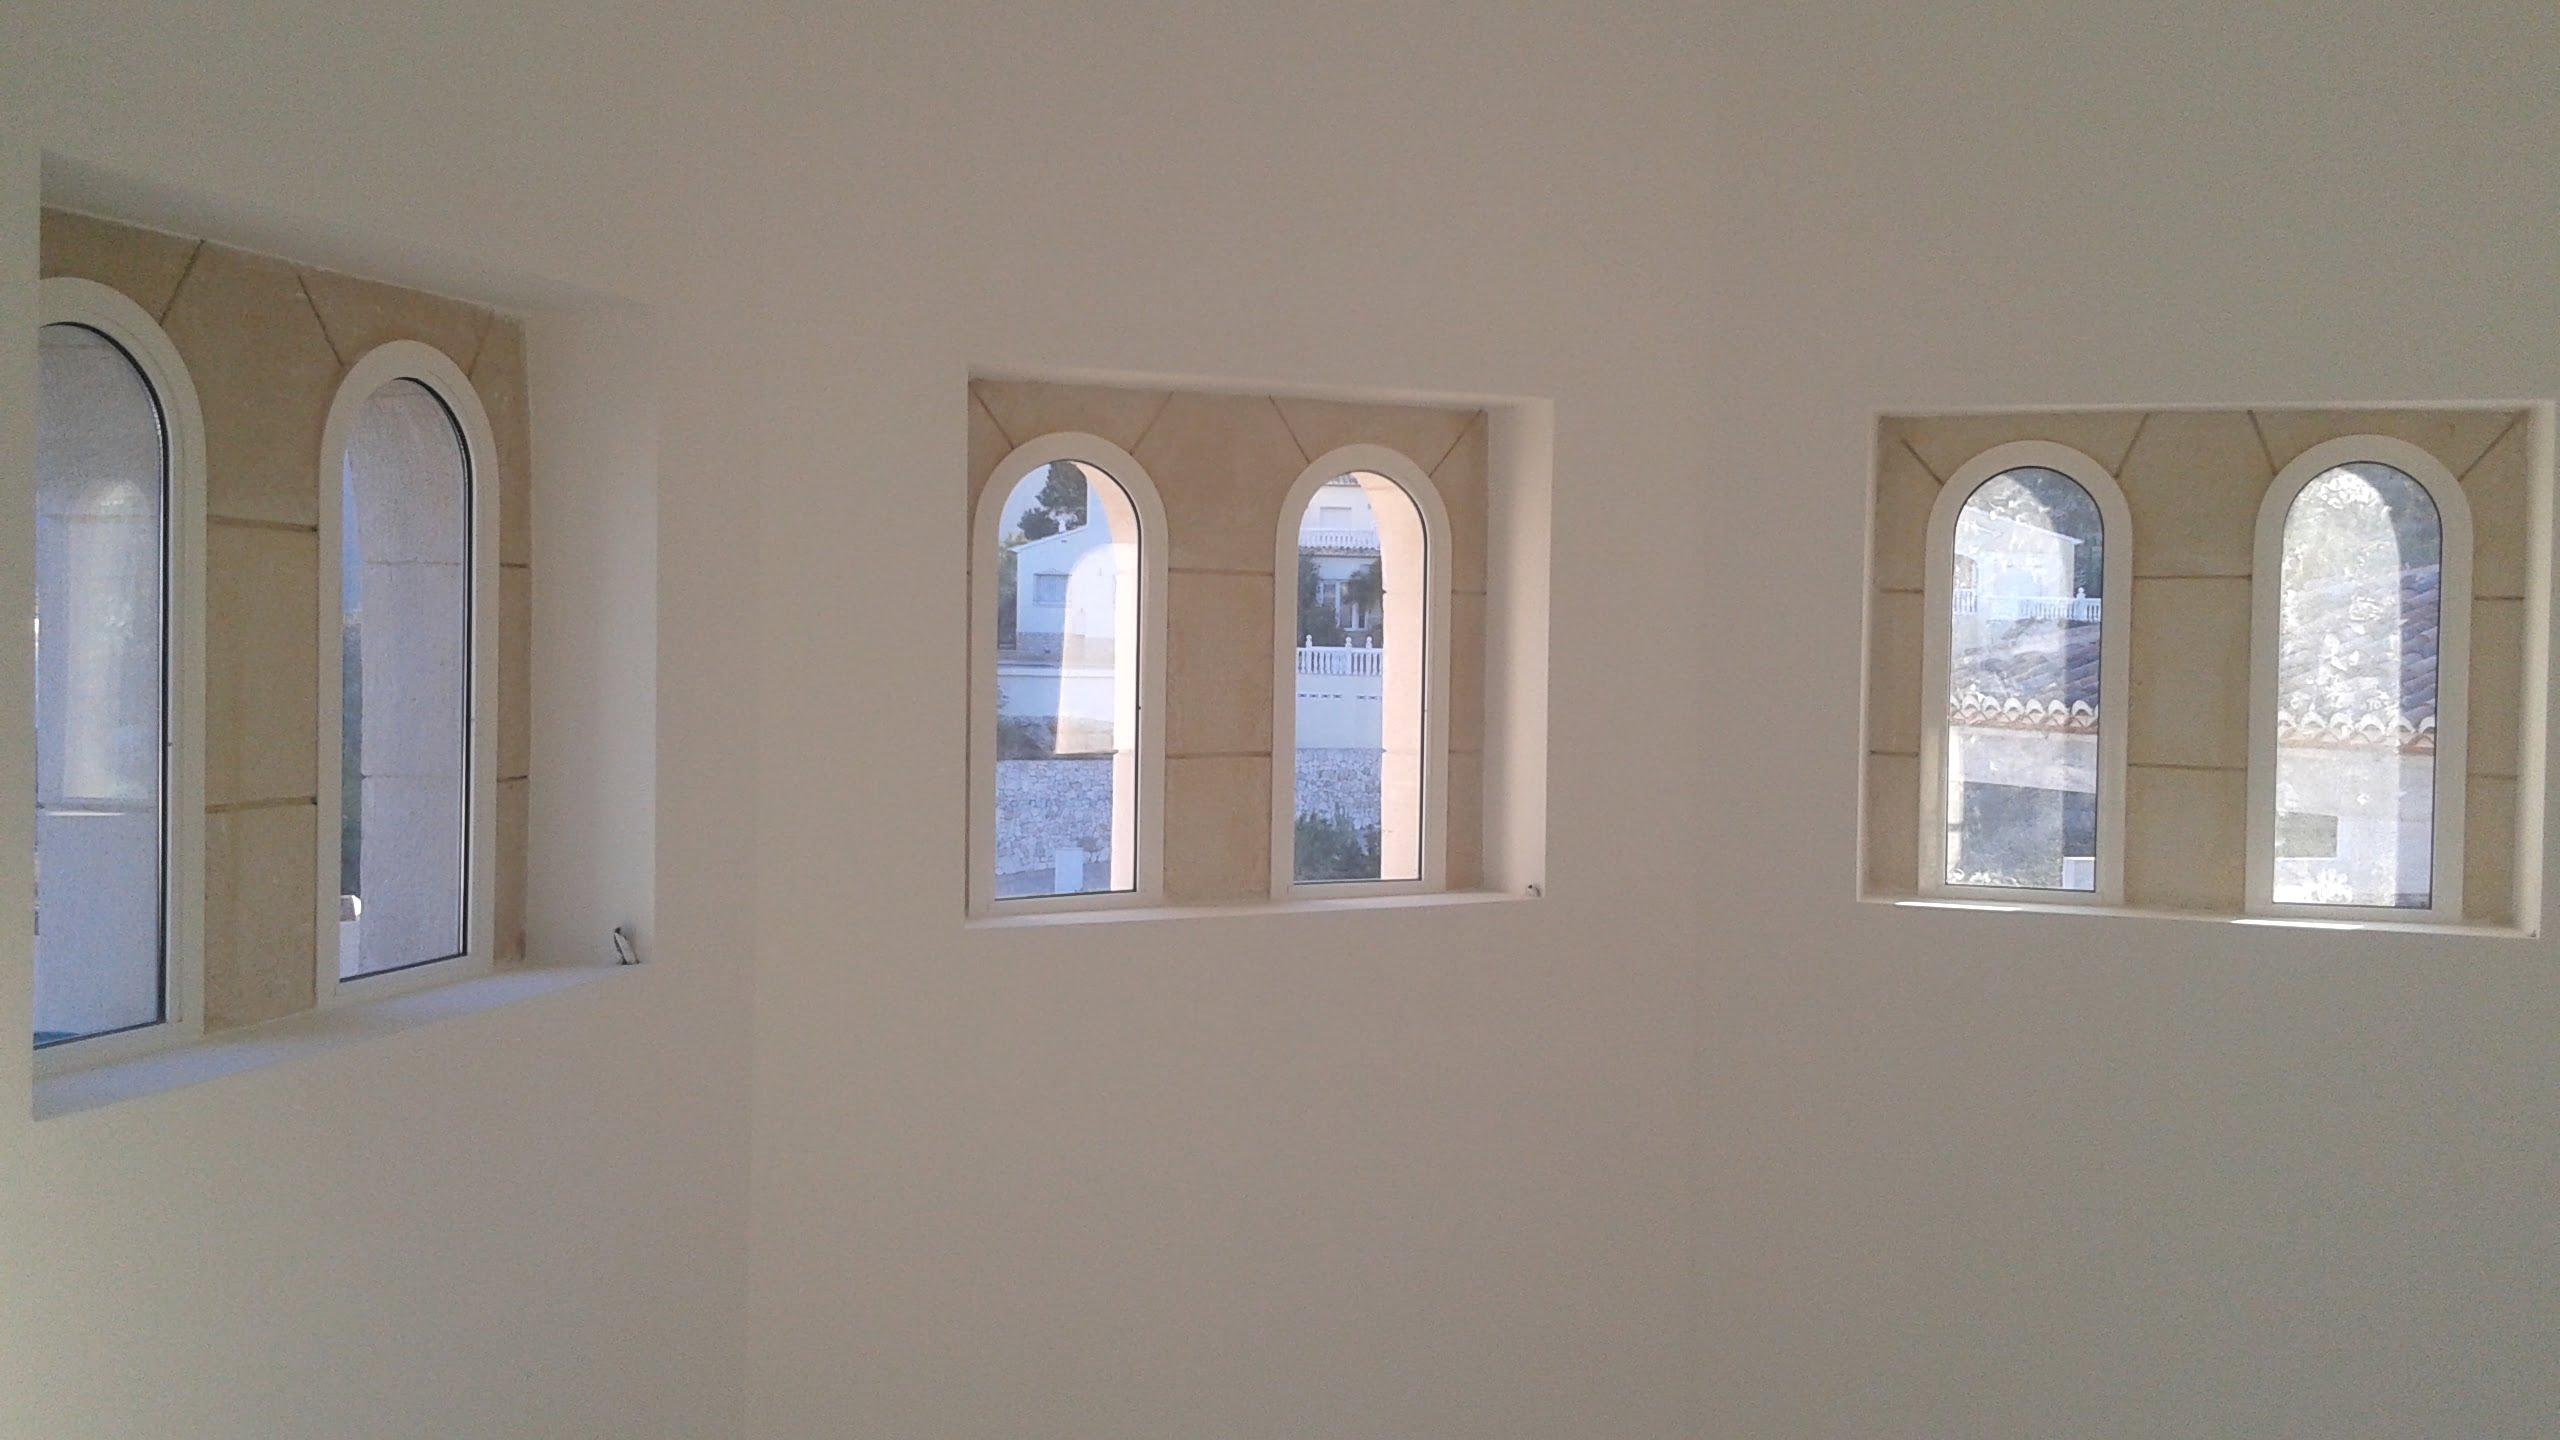 ventanas pequeñas